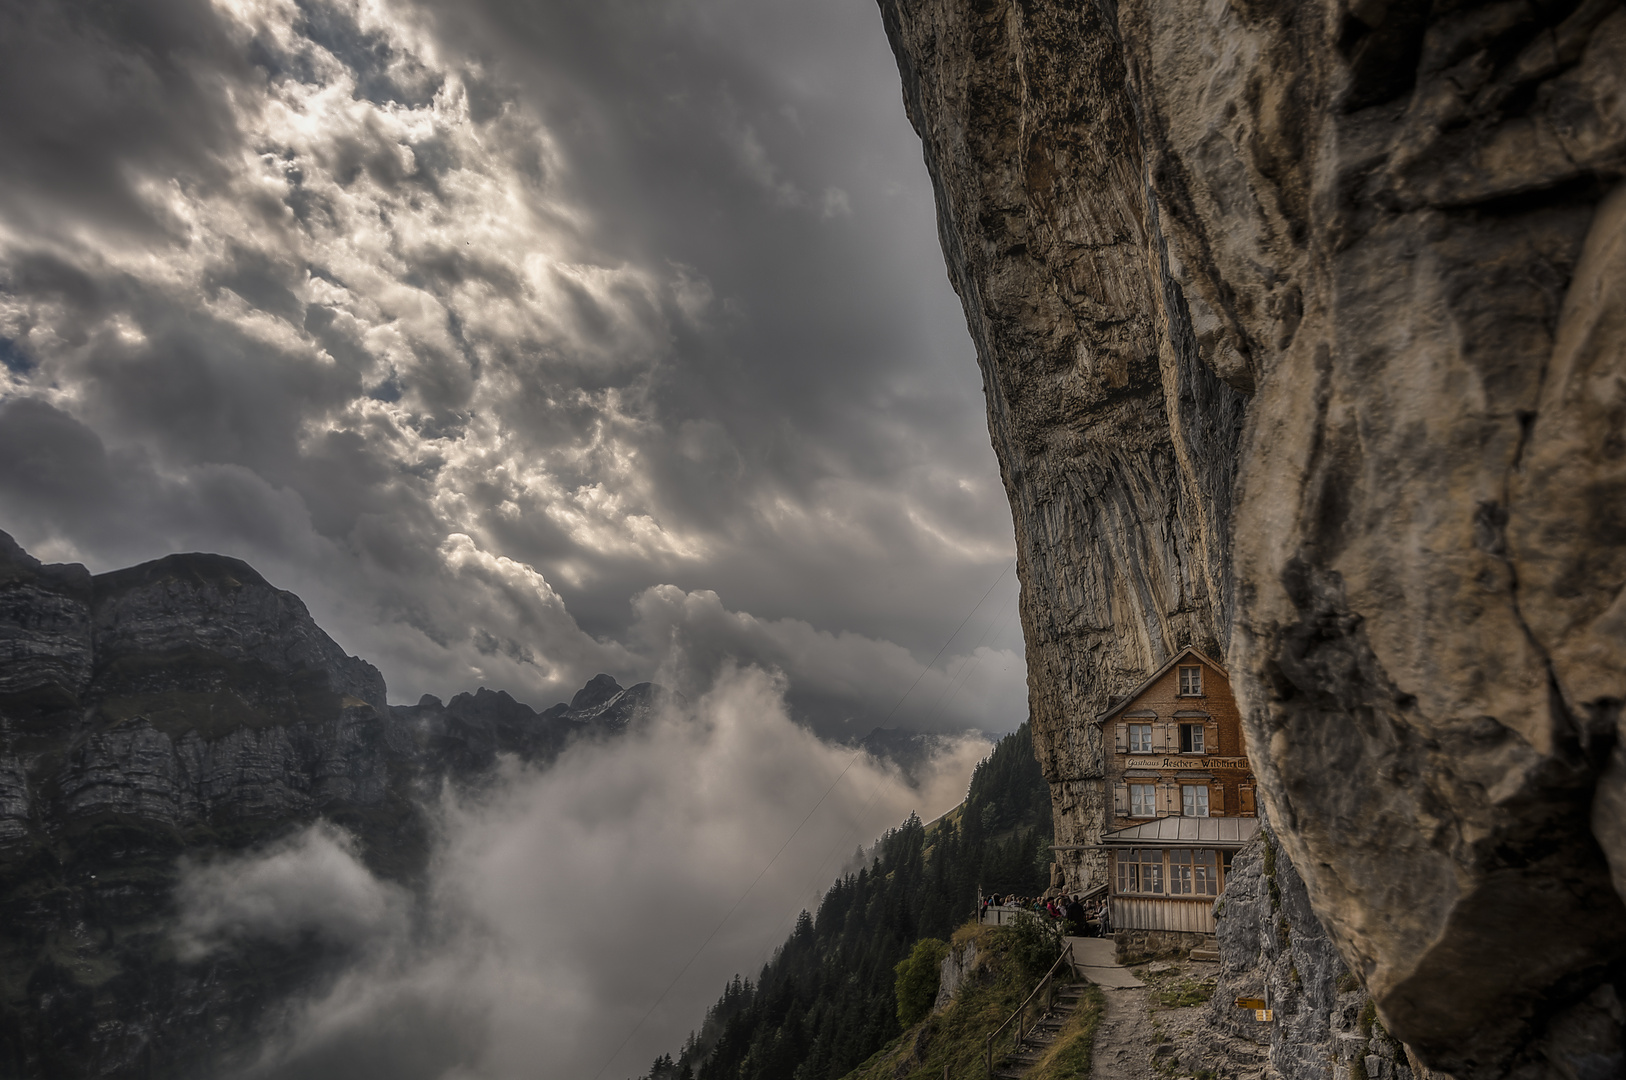 Berggasthaus Aescher @Appenzell